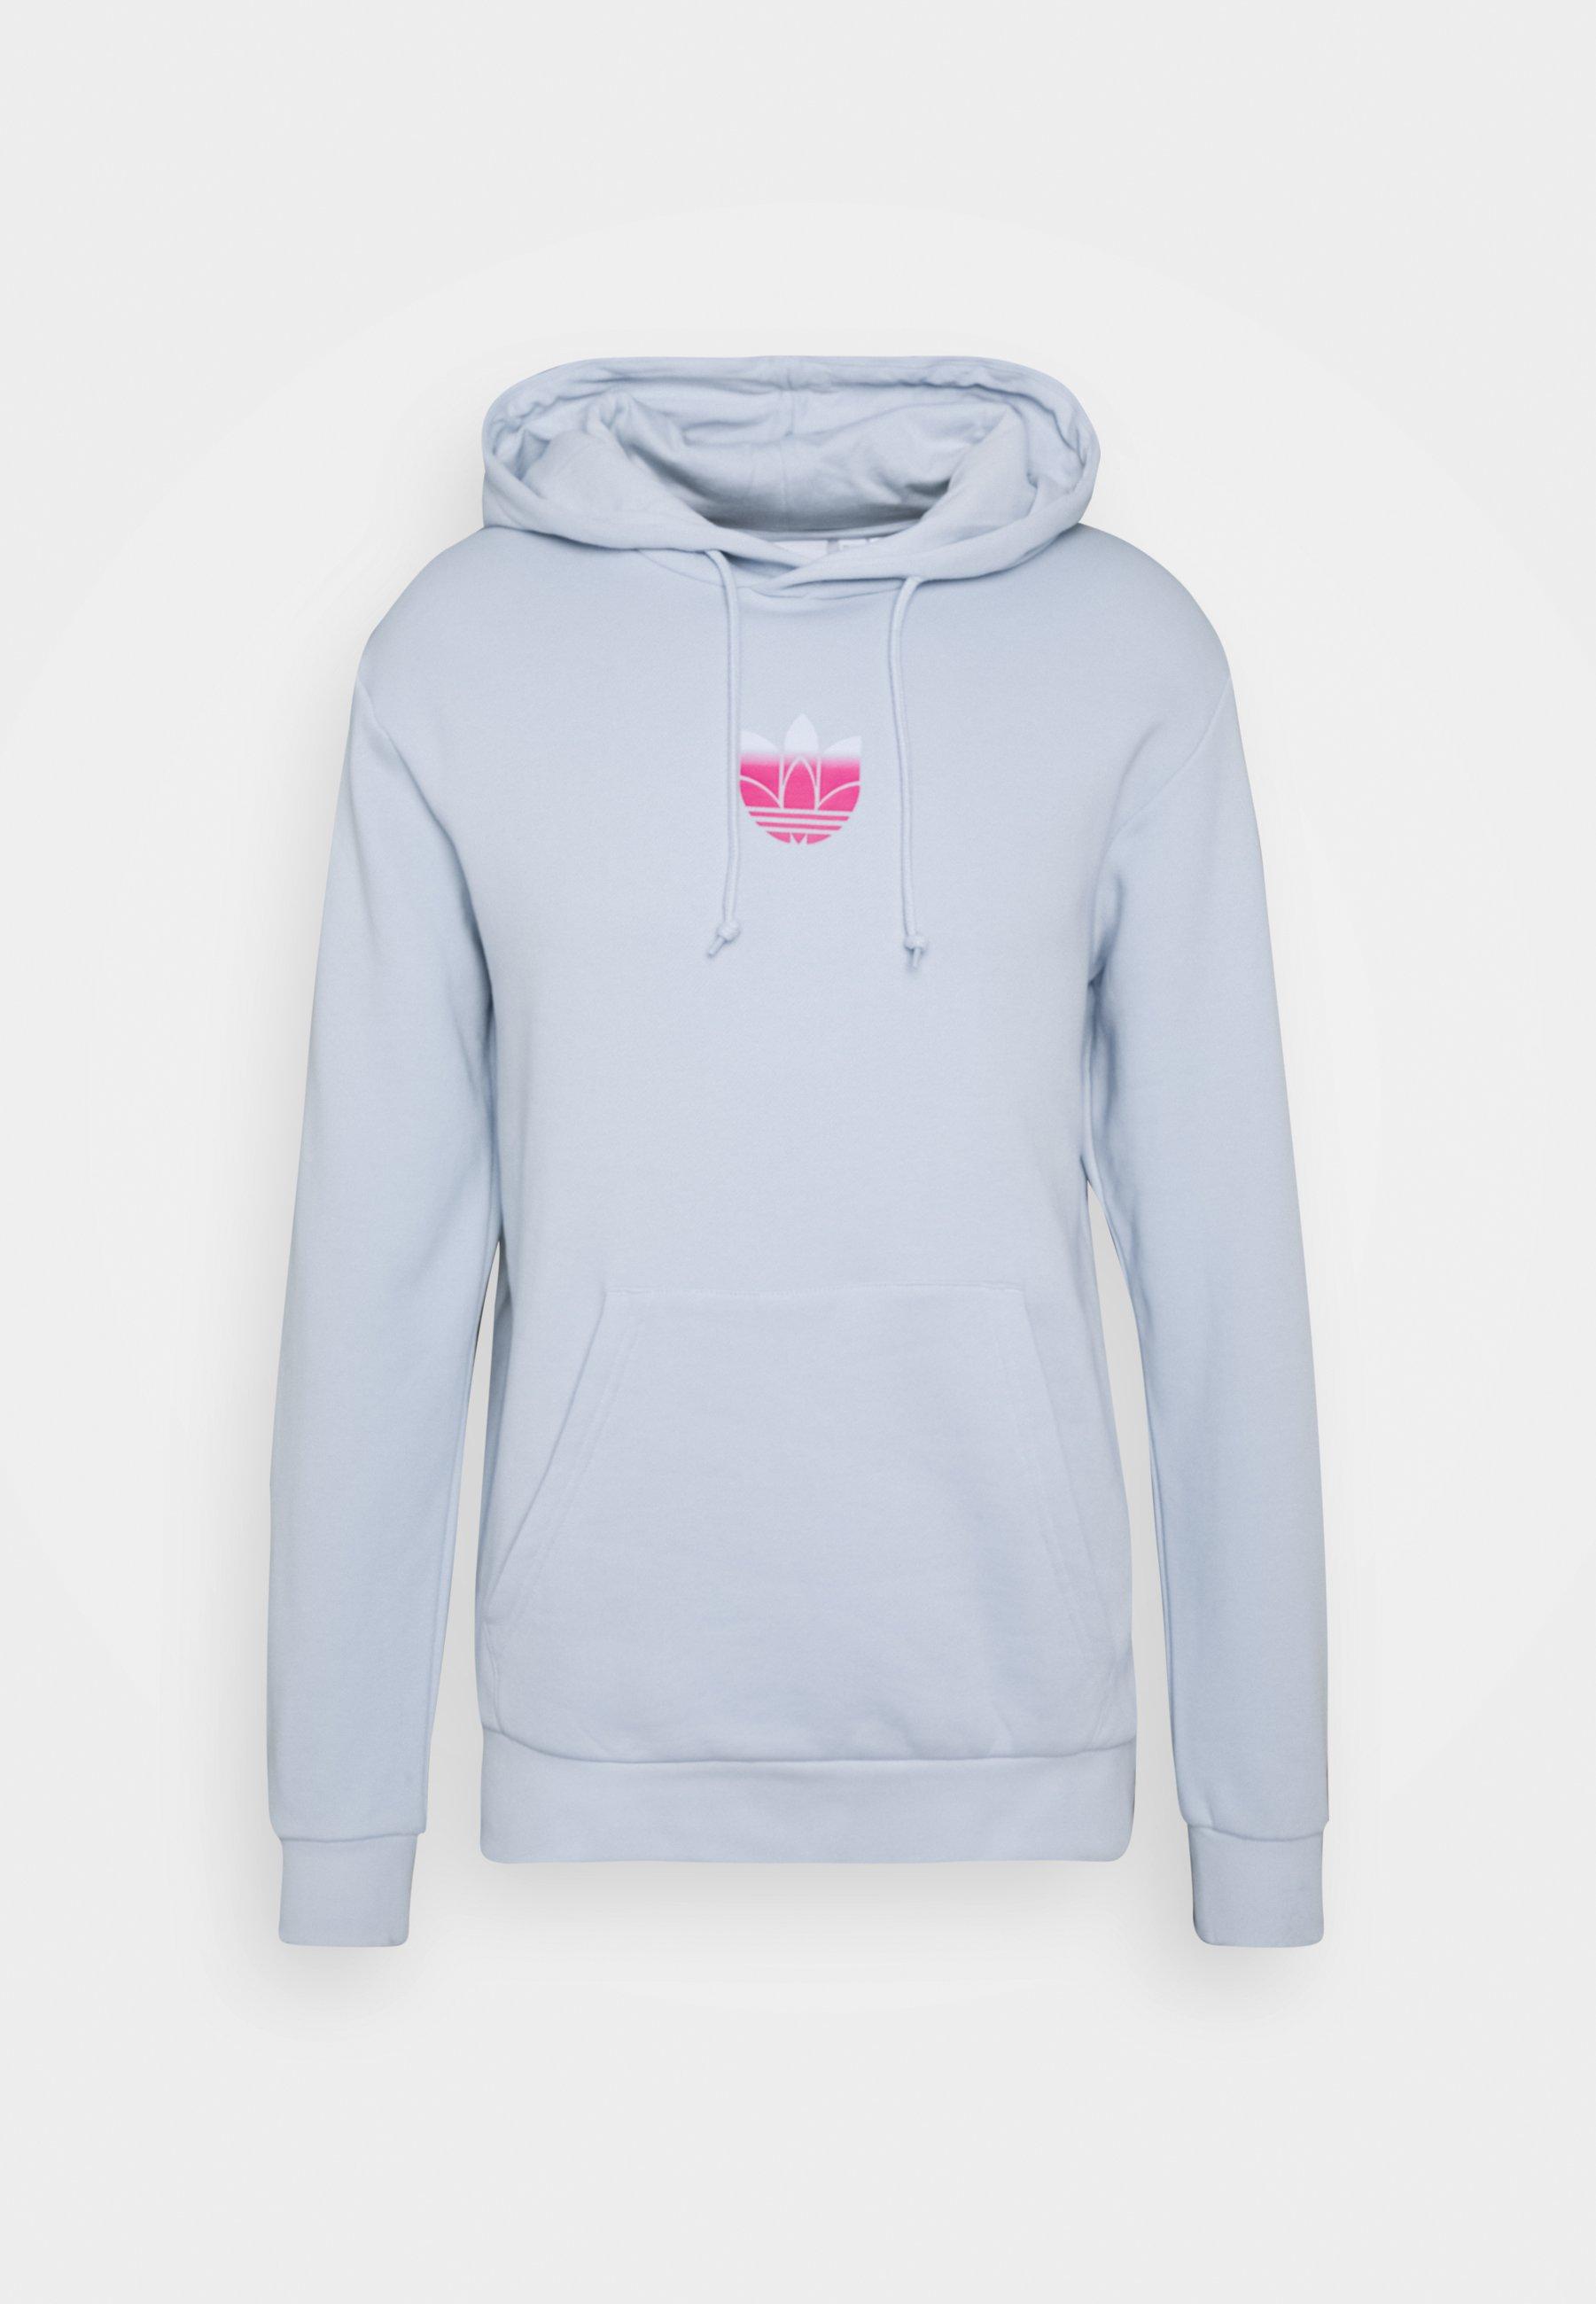 Femme HOODY UNISEX - Sweatshirt